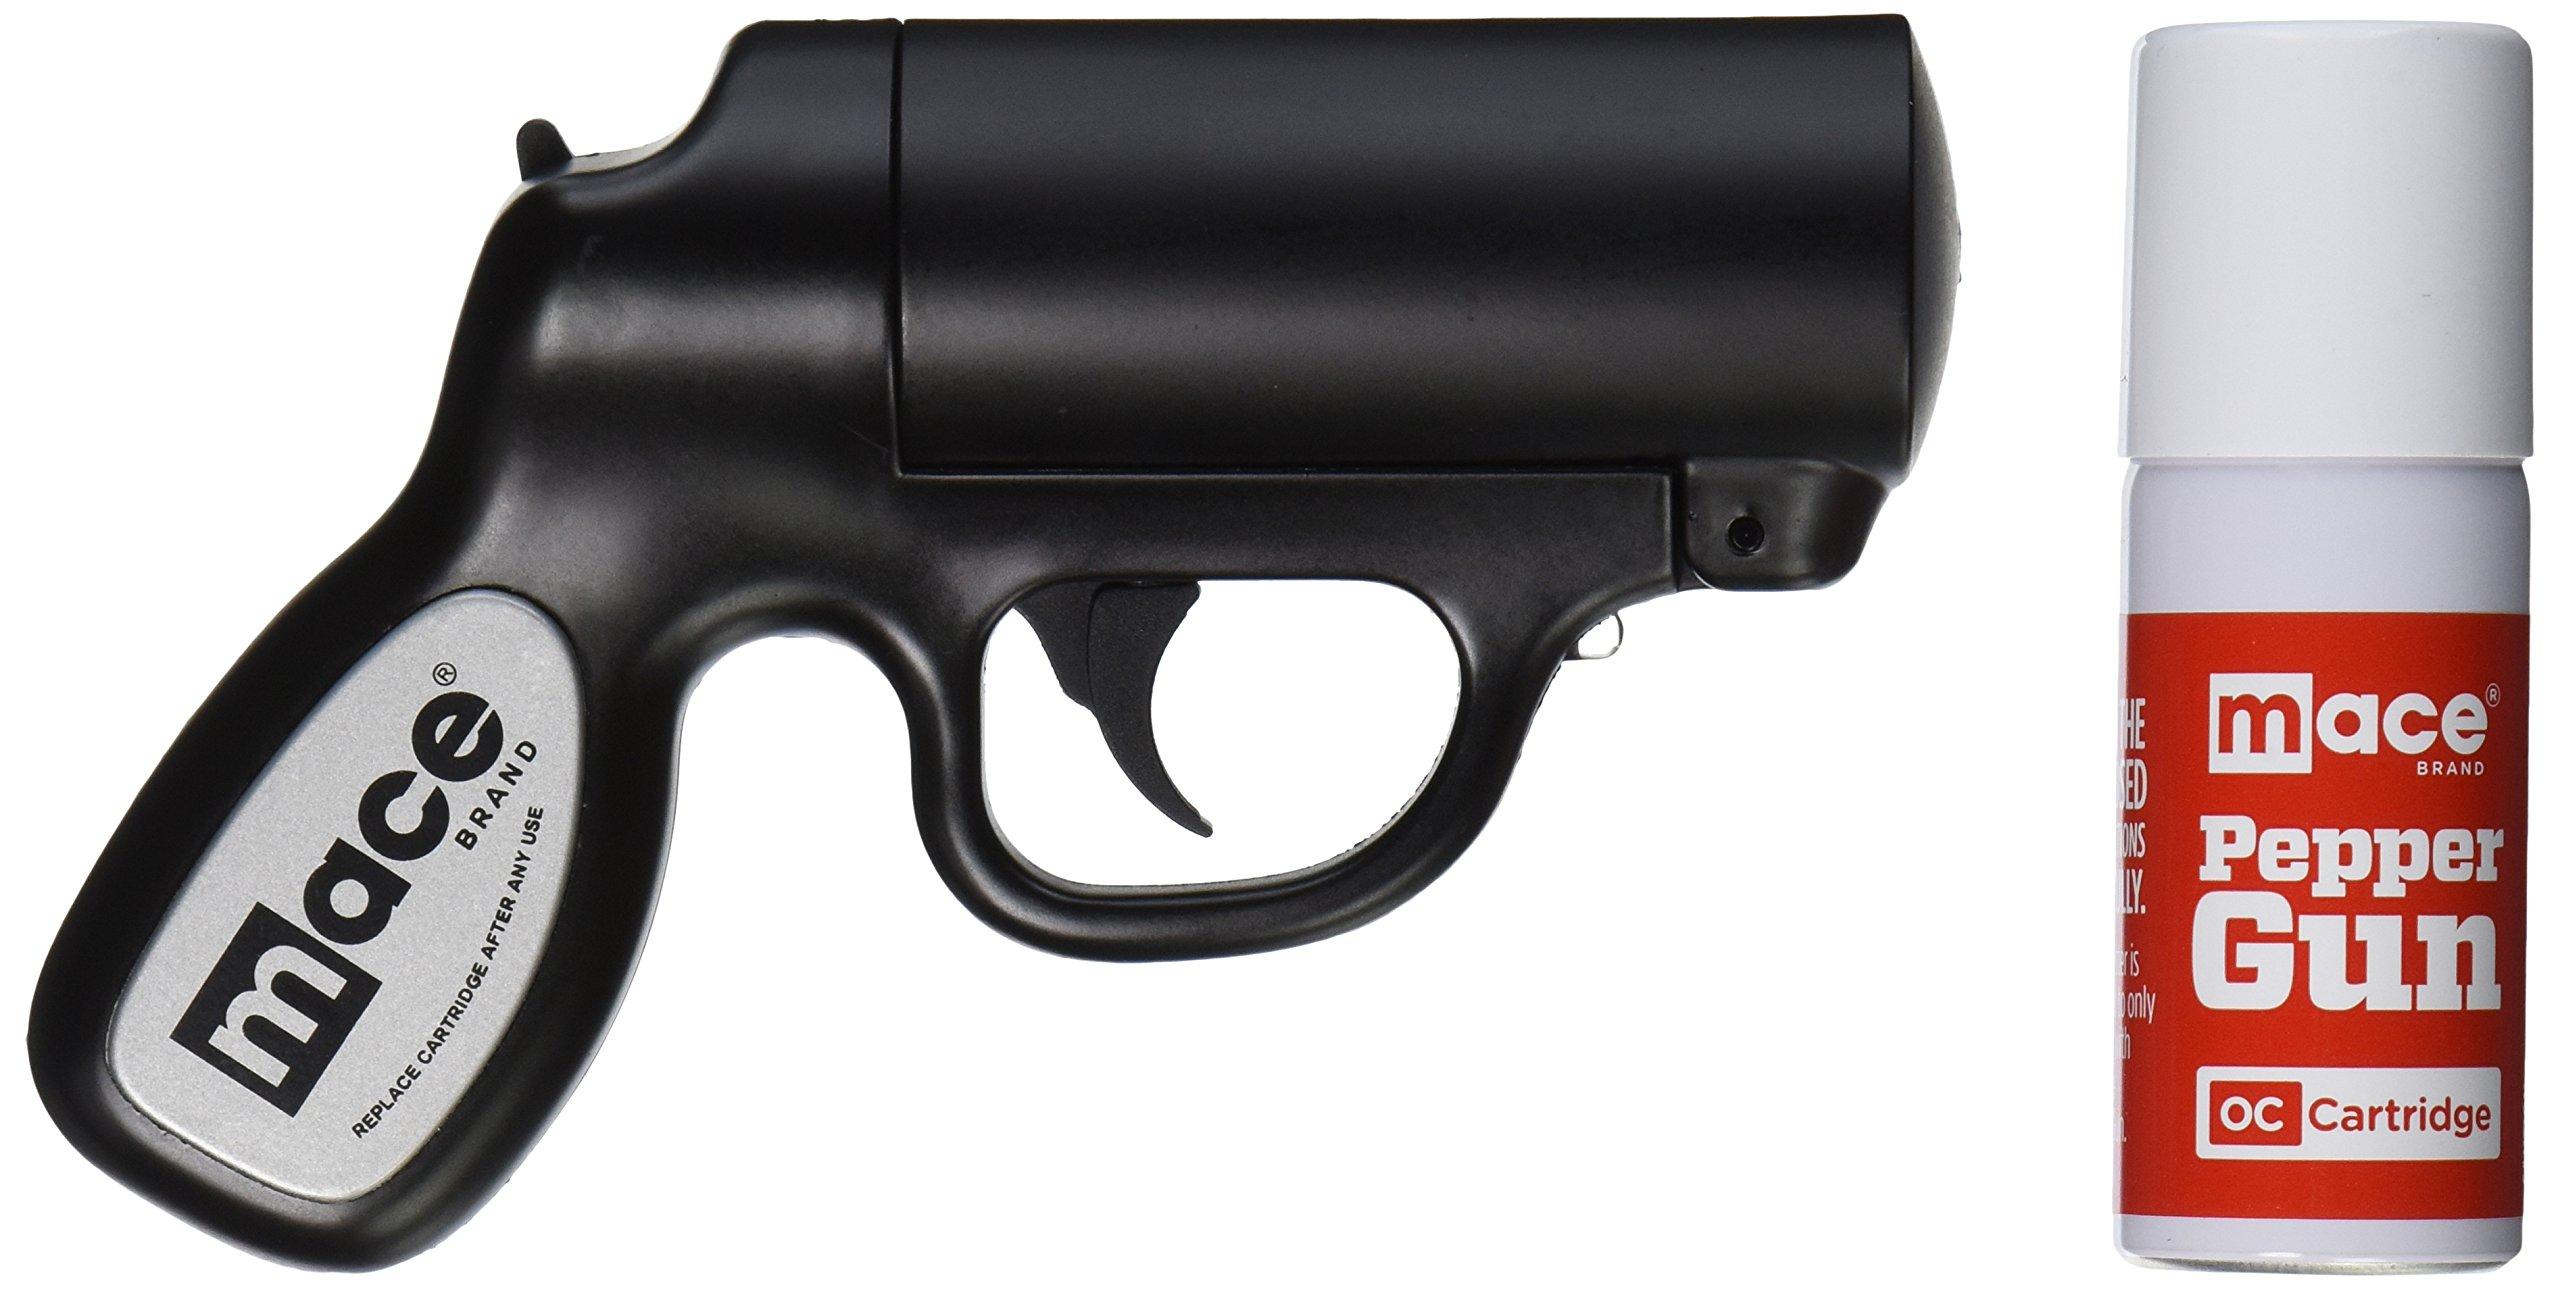 Mace Pepper Gun - Mat Blk W/Strobe Led by Mace